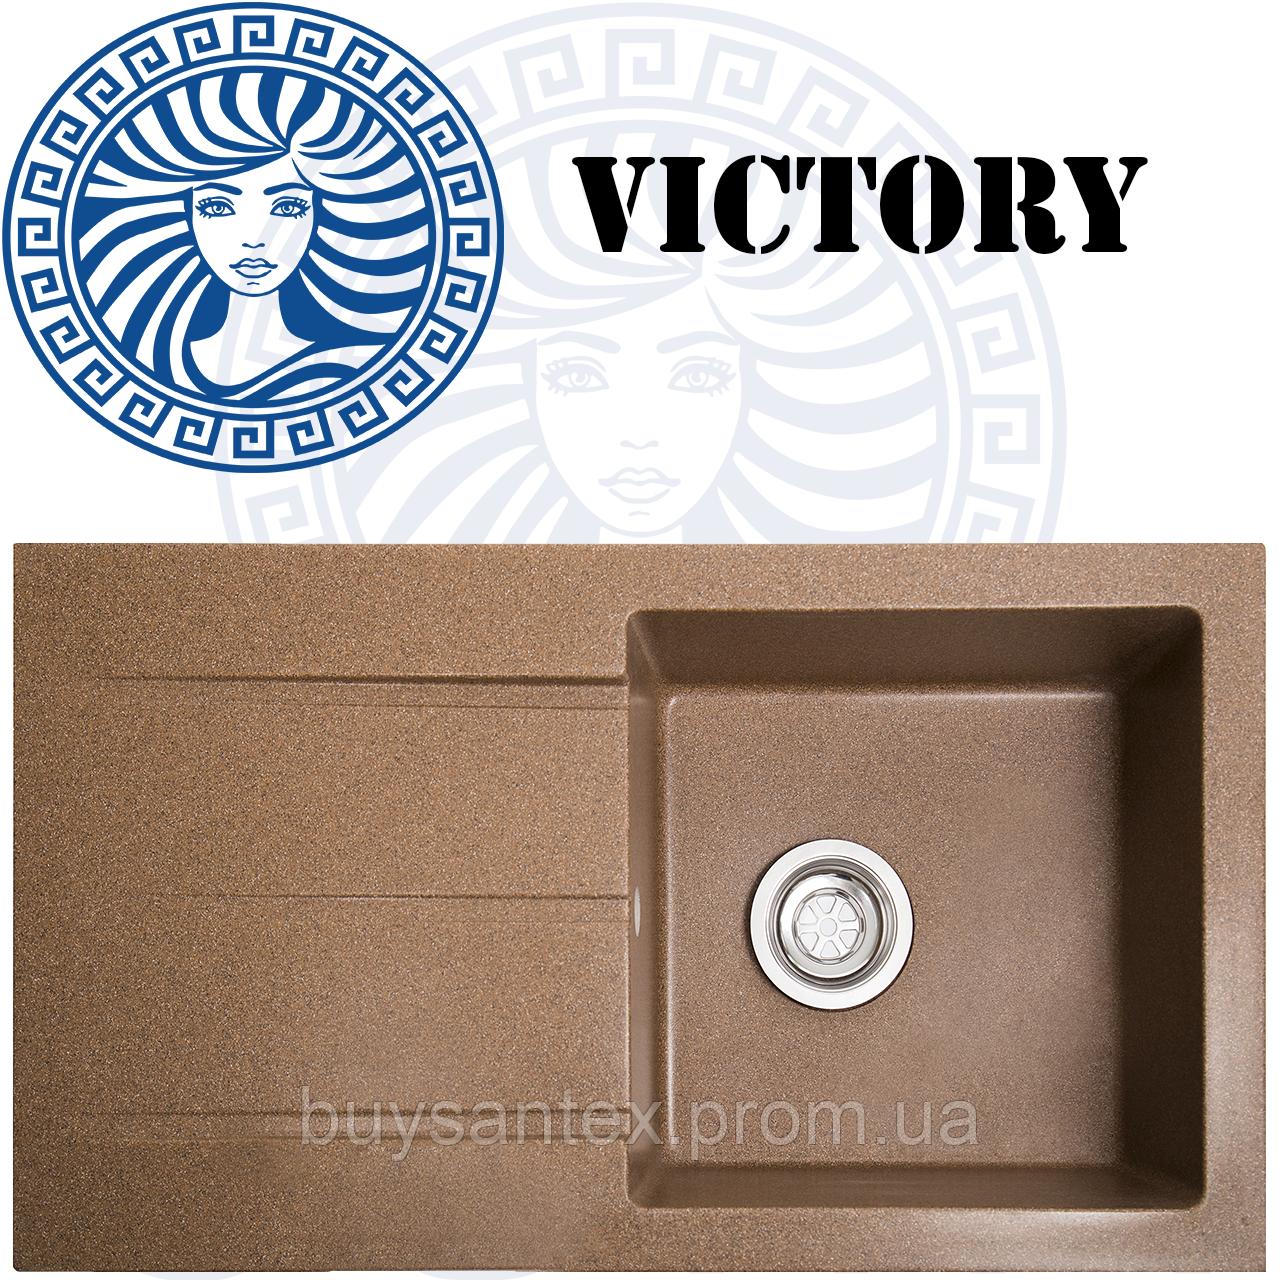 Кухонная мойка Cora - Victory Brown